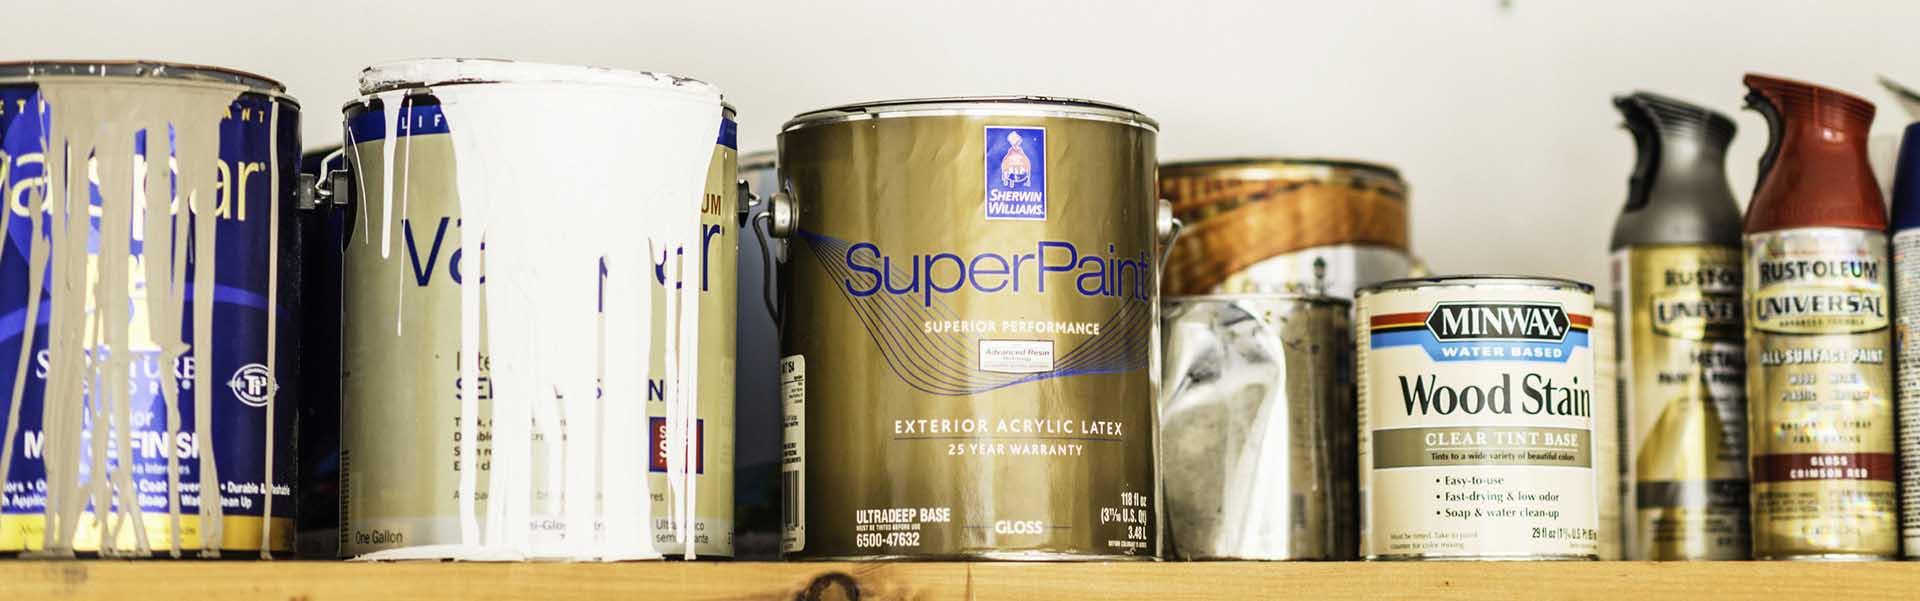 paint-tins-banner.jpg